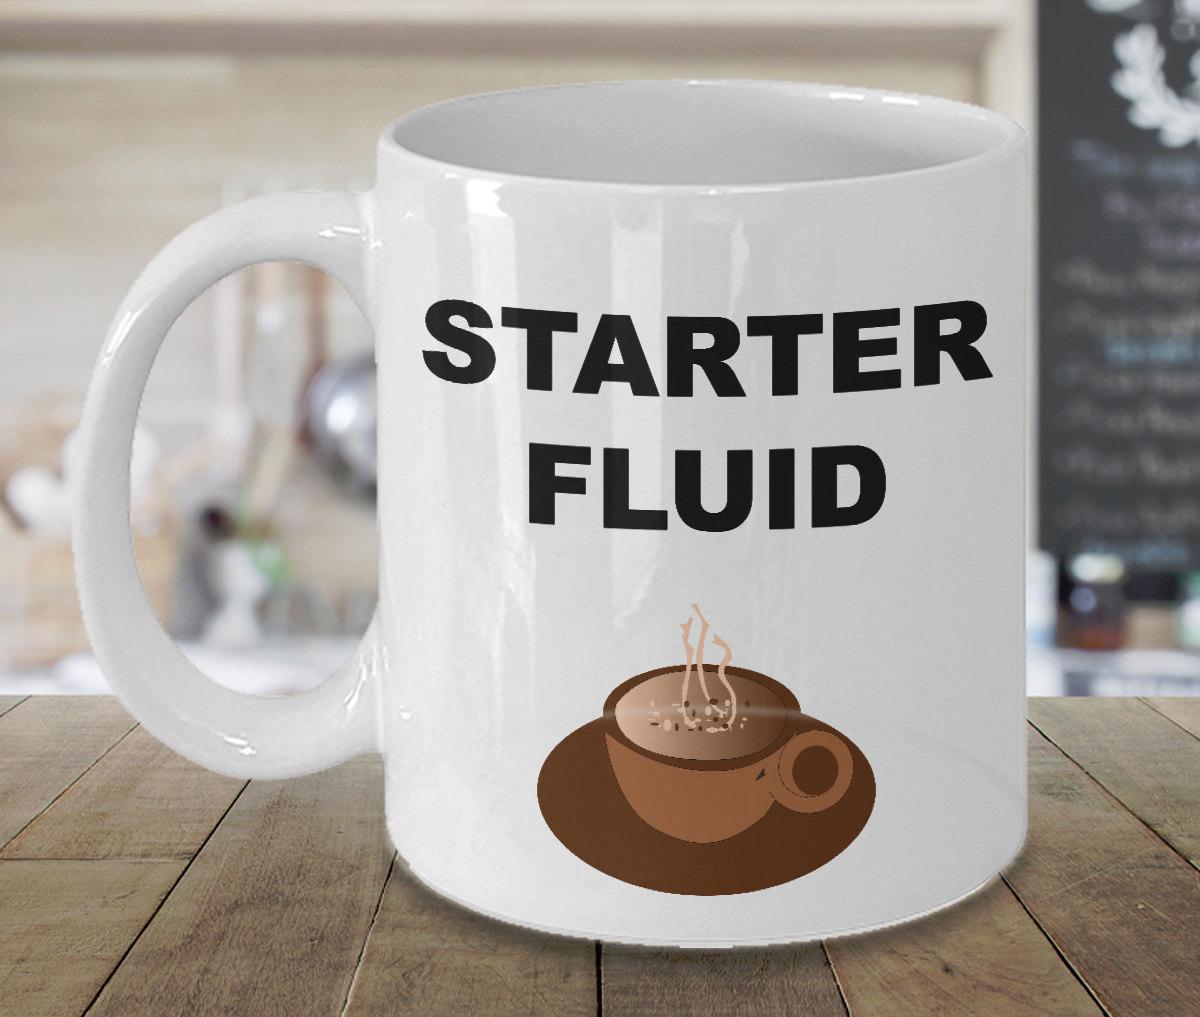 Fun Funny Coffee Mug Birthday Gift Mugs with Saying For Him Her Men Women Dad Mo